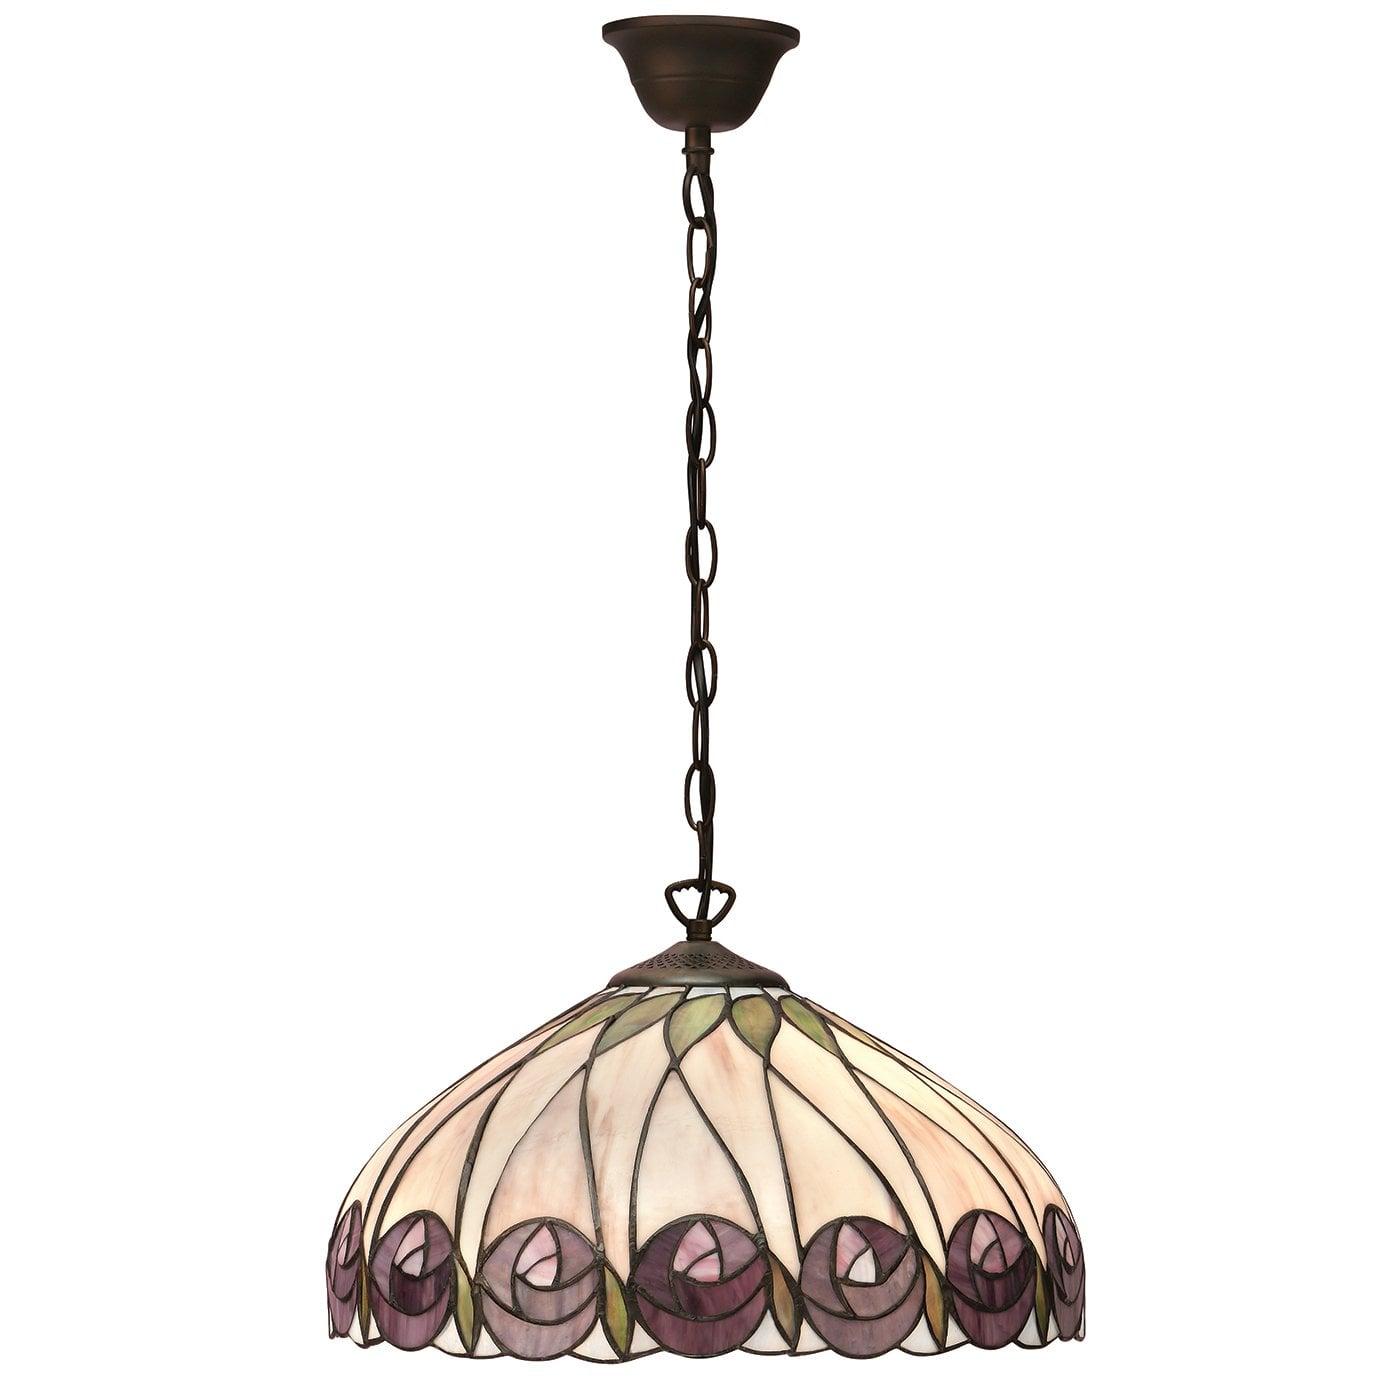 Interiors 1900 64176 Hutchinson Medium 1lt pendant, Tiffany